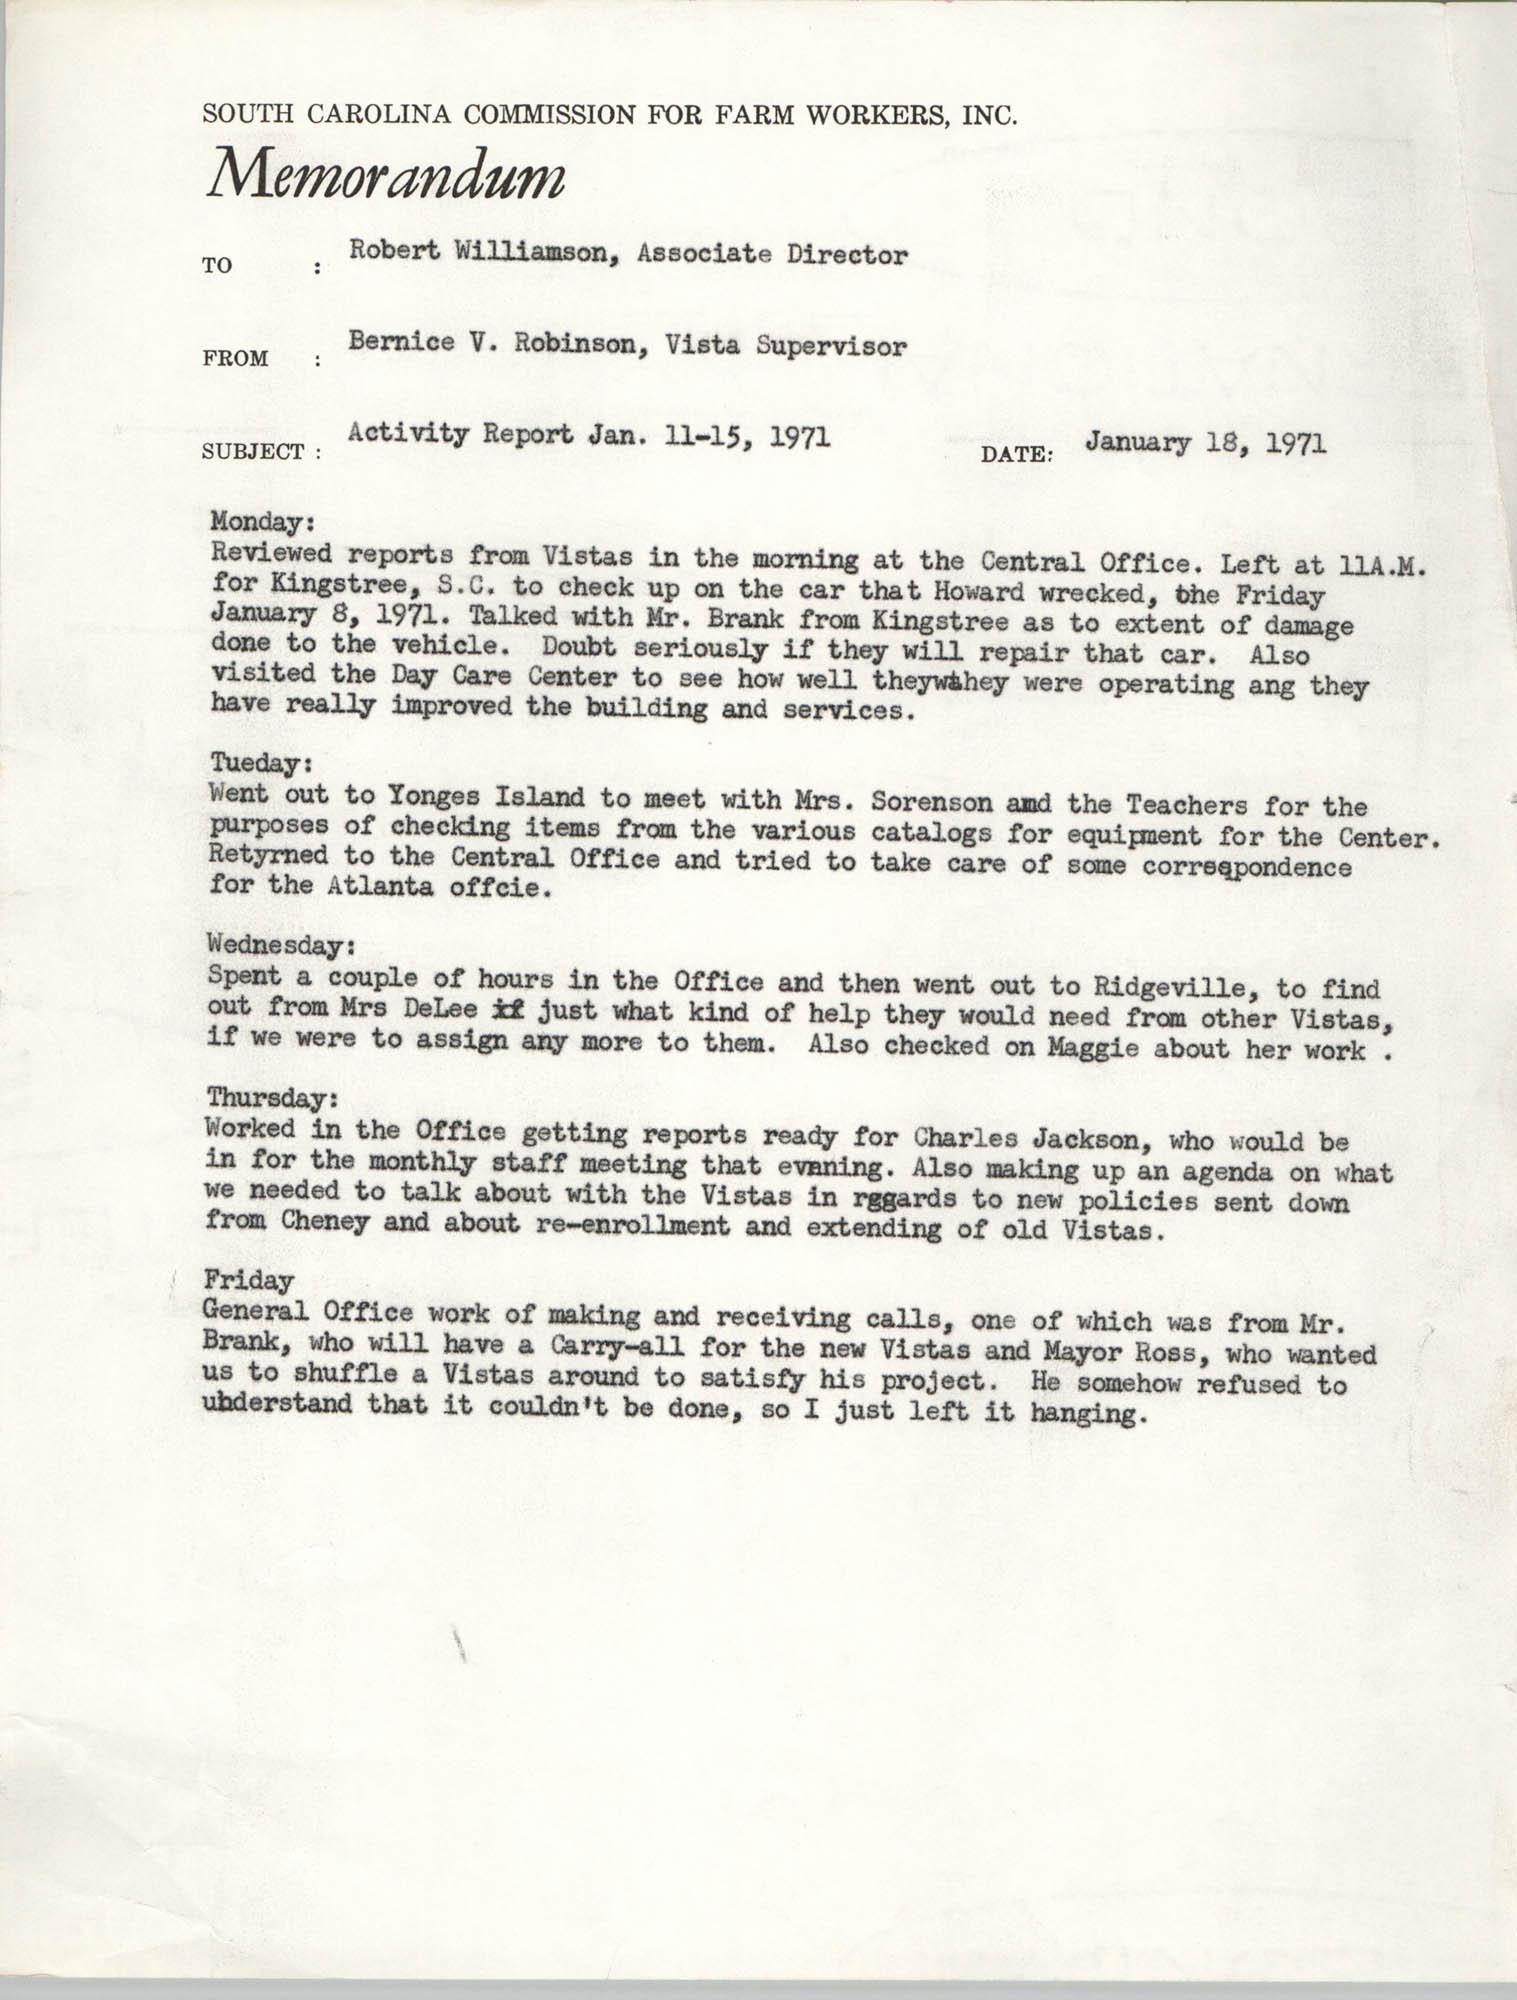 Memorandum from Bernice V. Robinson to Robert Williamson, January 18, 1971